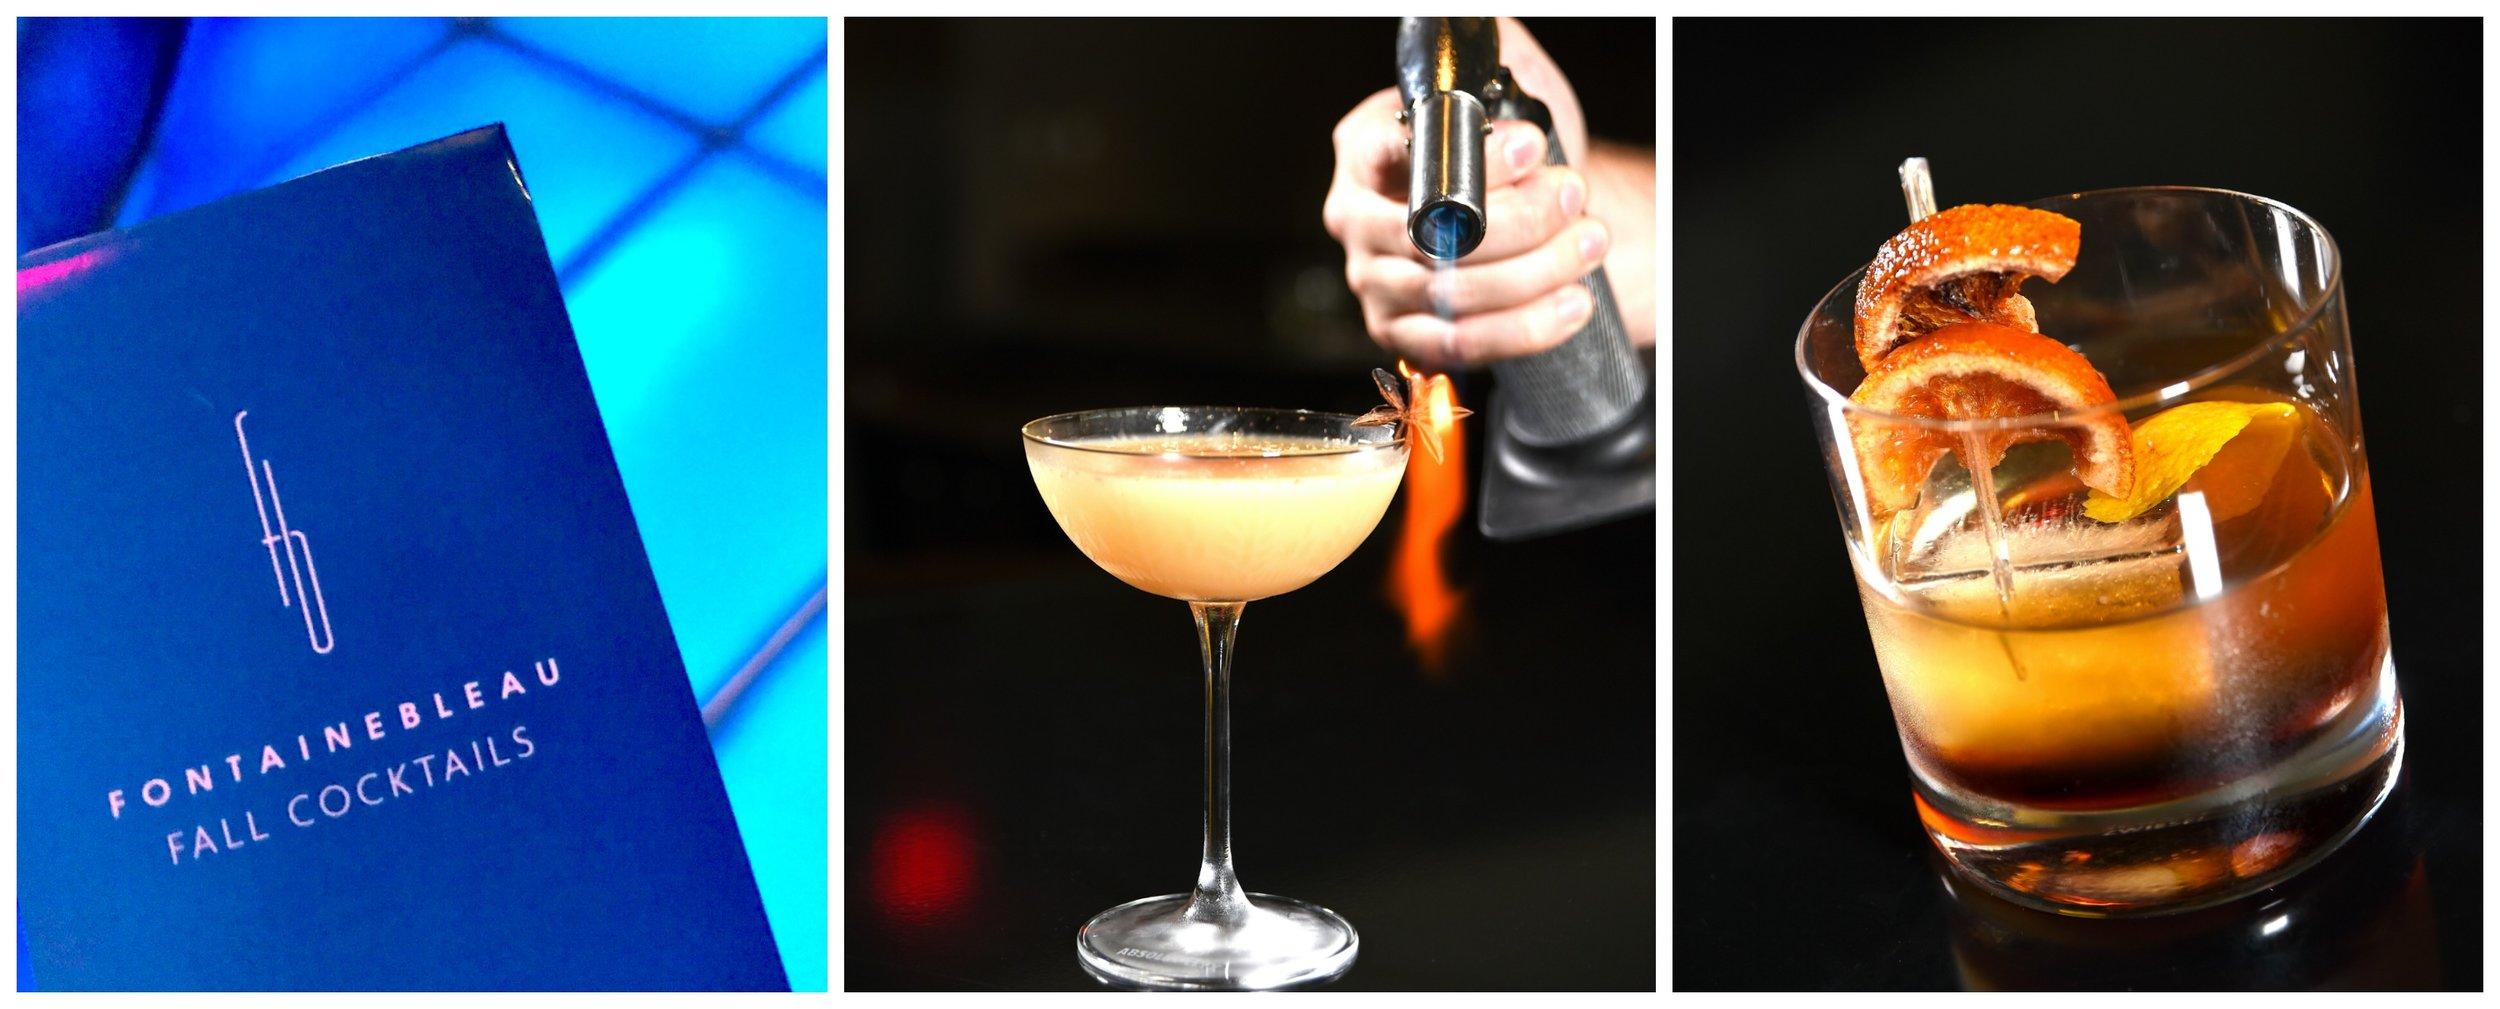 Fontainebleau Miami Fall Cocktail